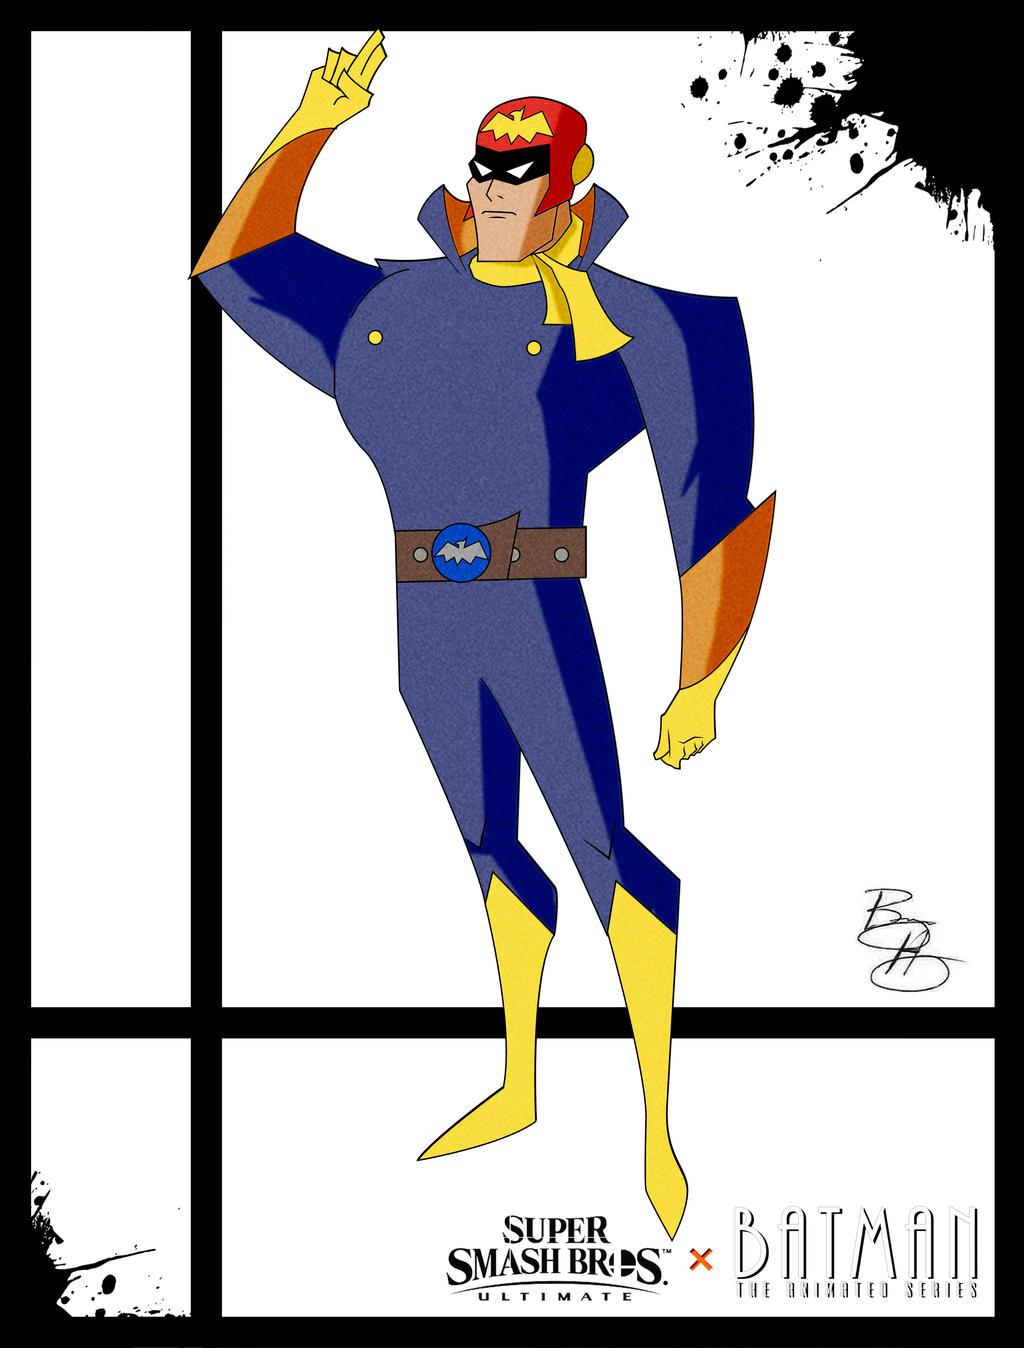 Super Smash Styles- 11 Cpt Falcon x Batman